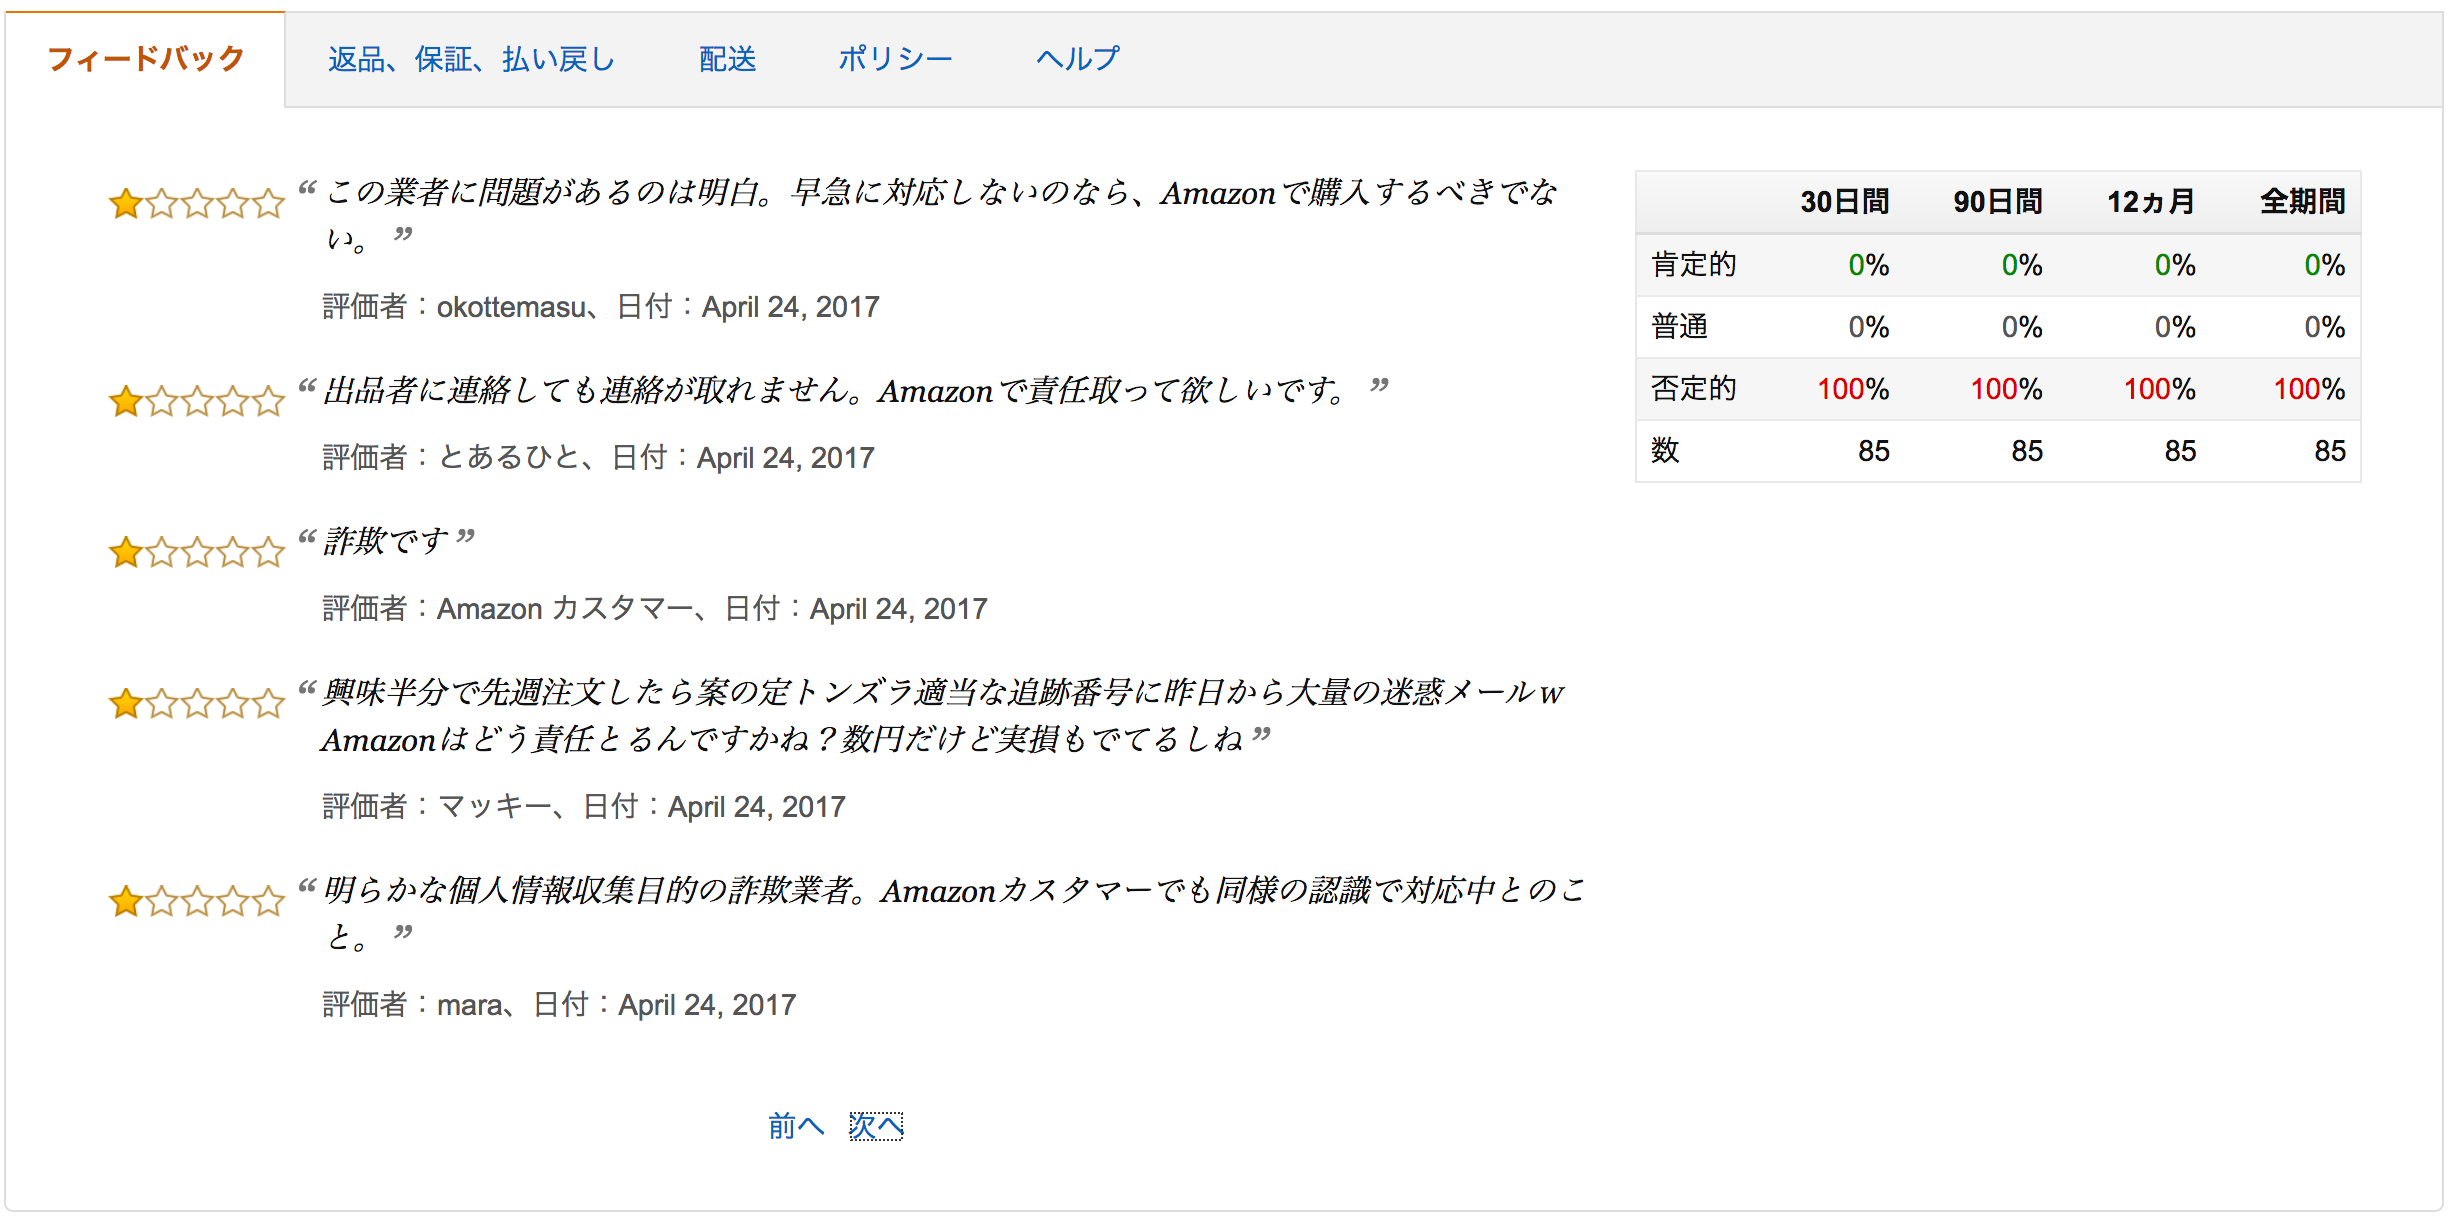 Amazonマーケットプレイス詐欺業者のアカウント